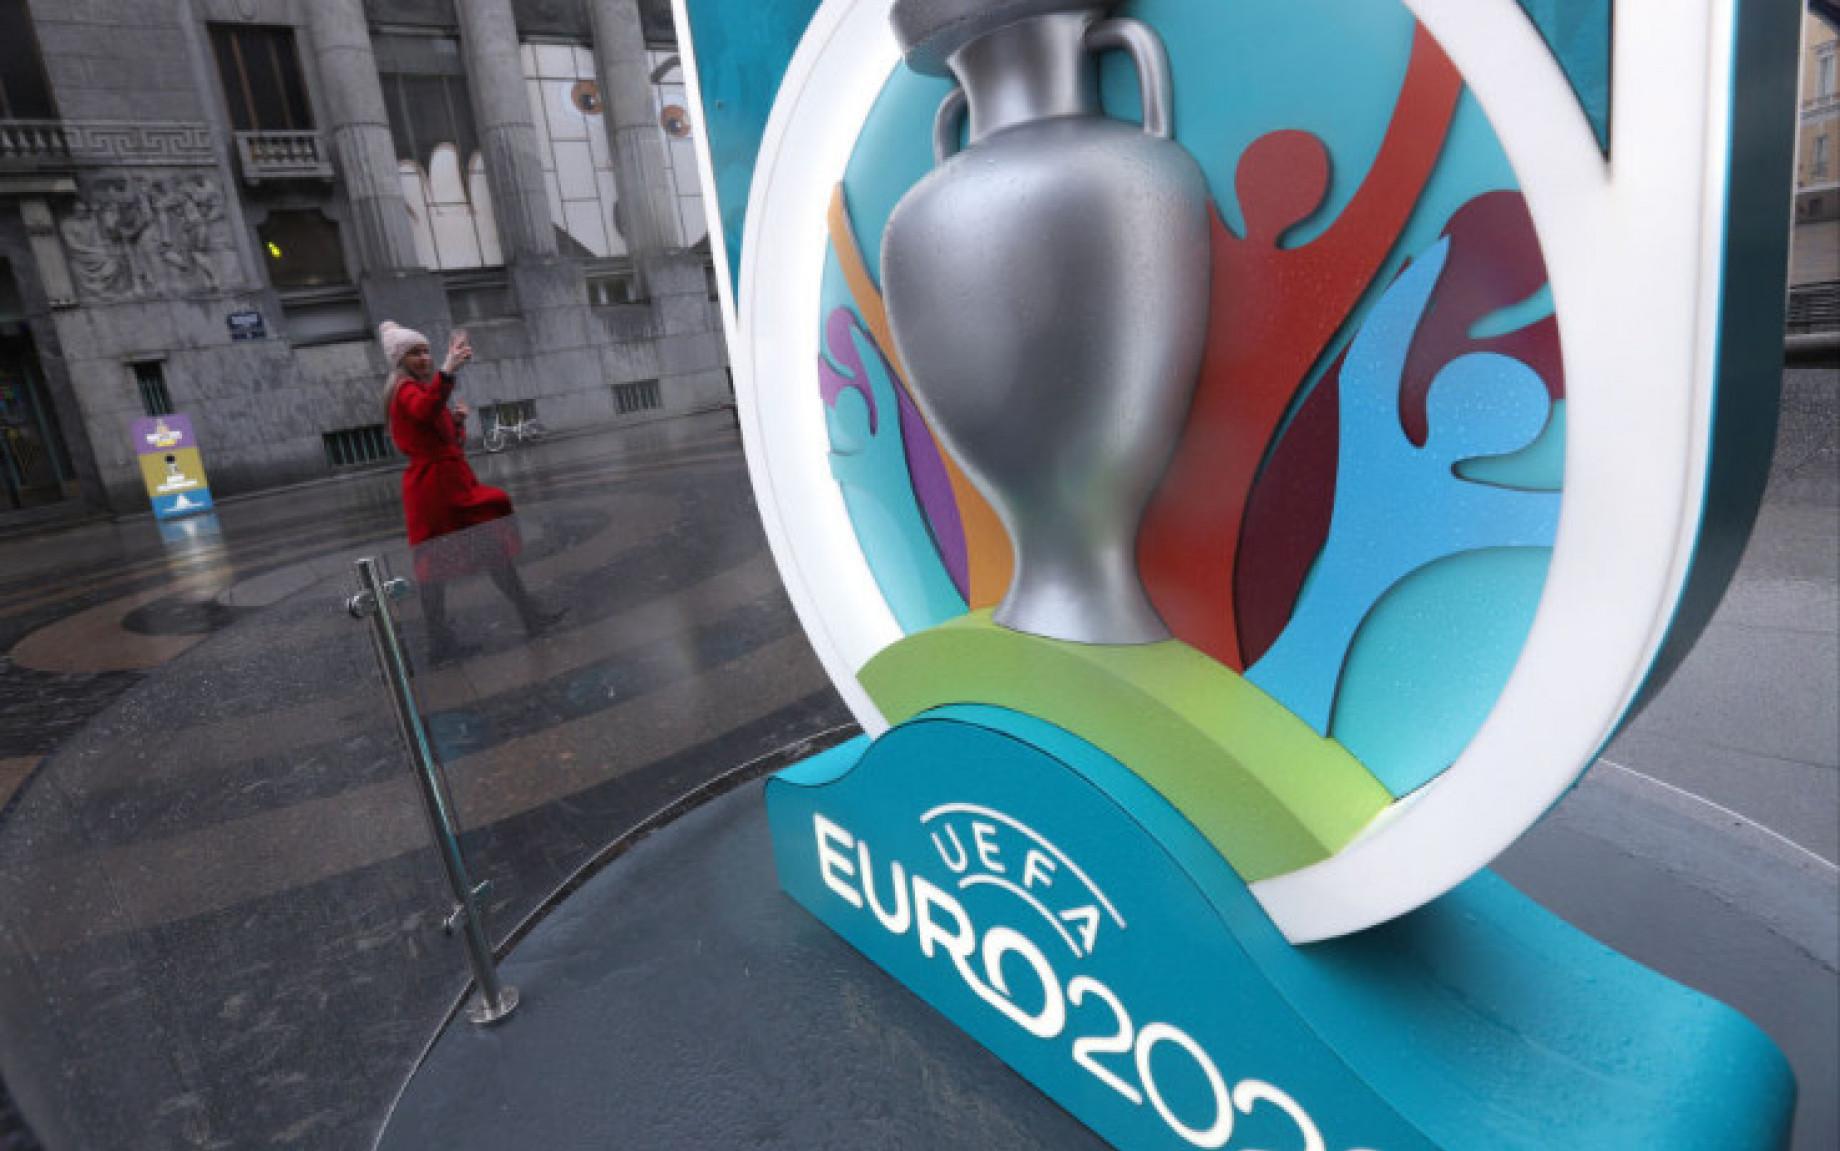 euro_2020_europeo_getty.jpg